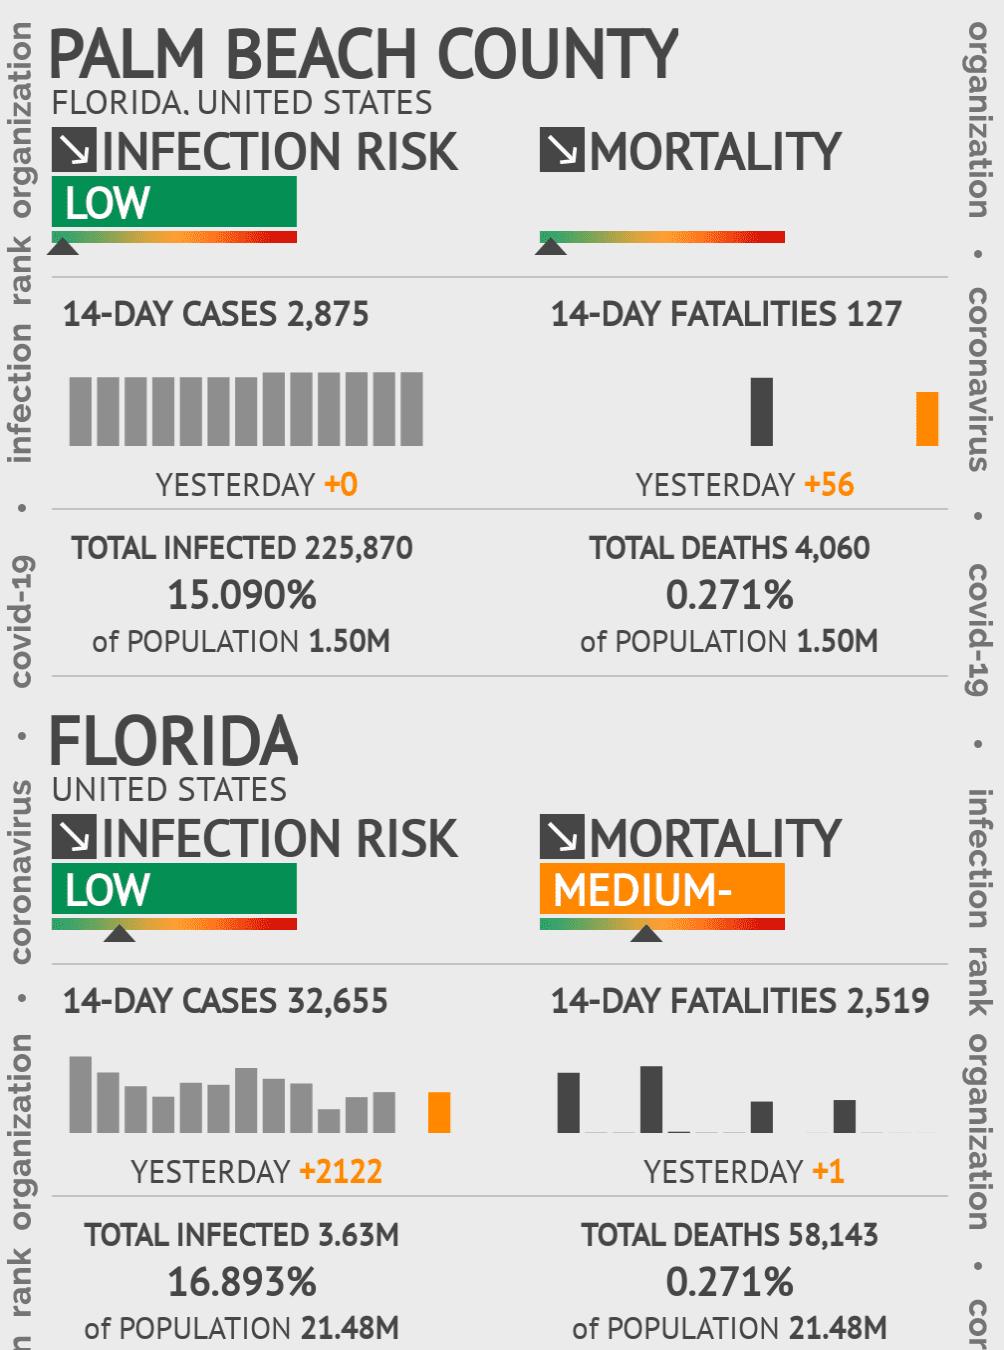 Palm Beach County Coronavirus Covid-19 Risk of Infection on February 25, 2021